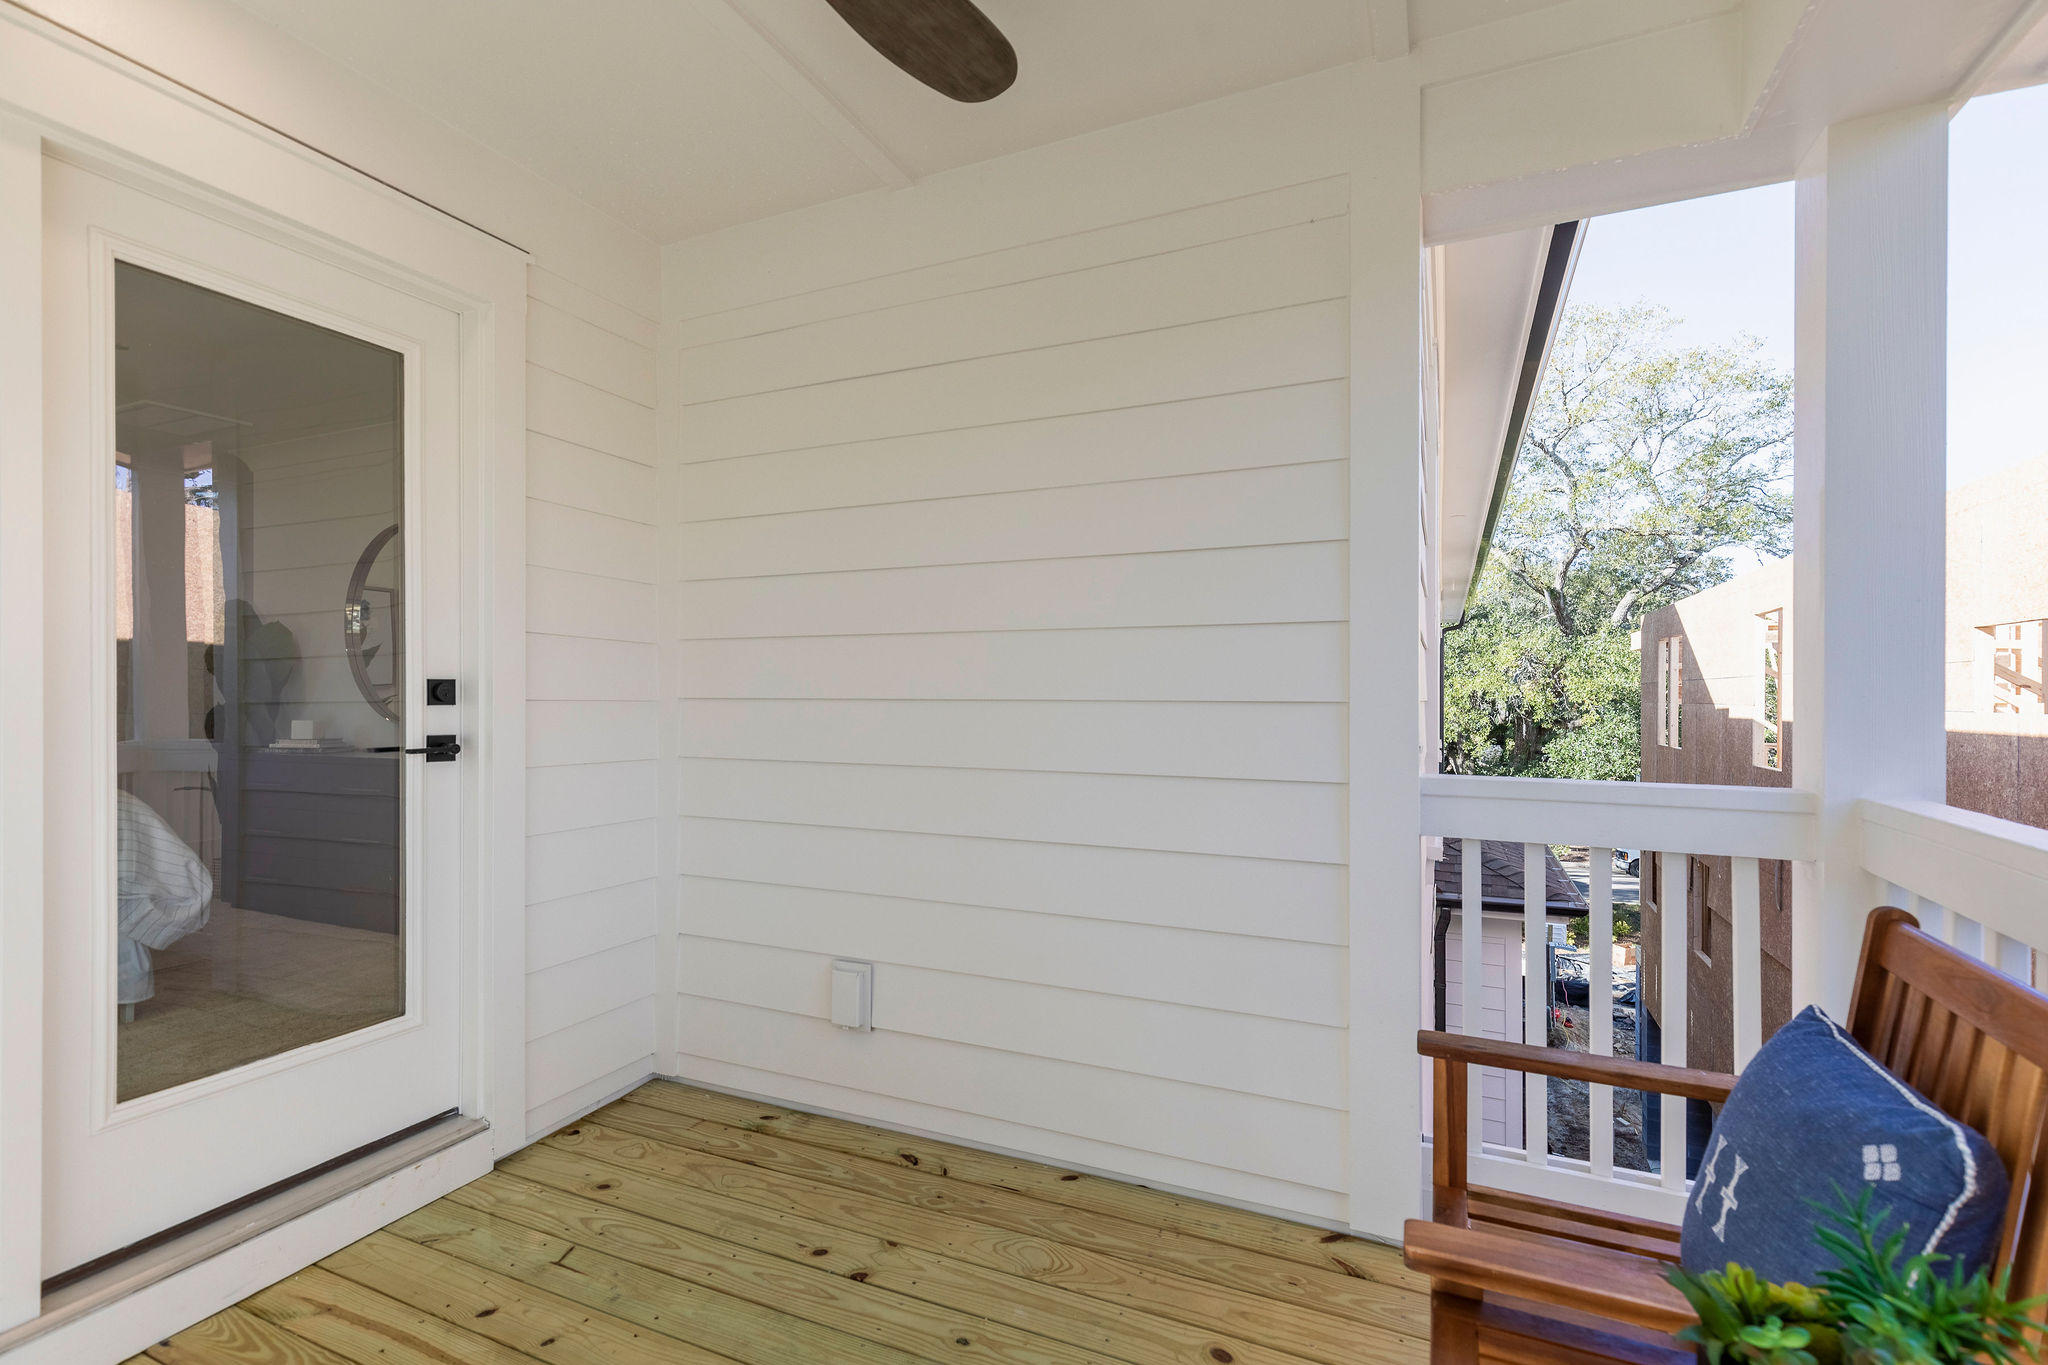 Avenue of Oaks Homes For Sale - 1027 Avenue Of Oaks, Charleston, SC - 9